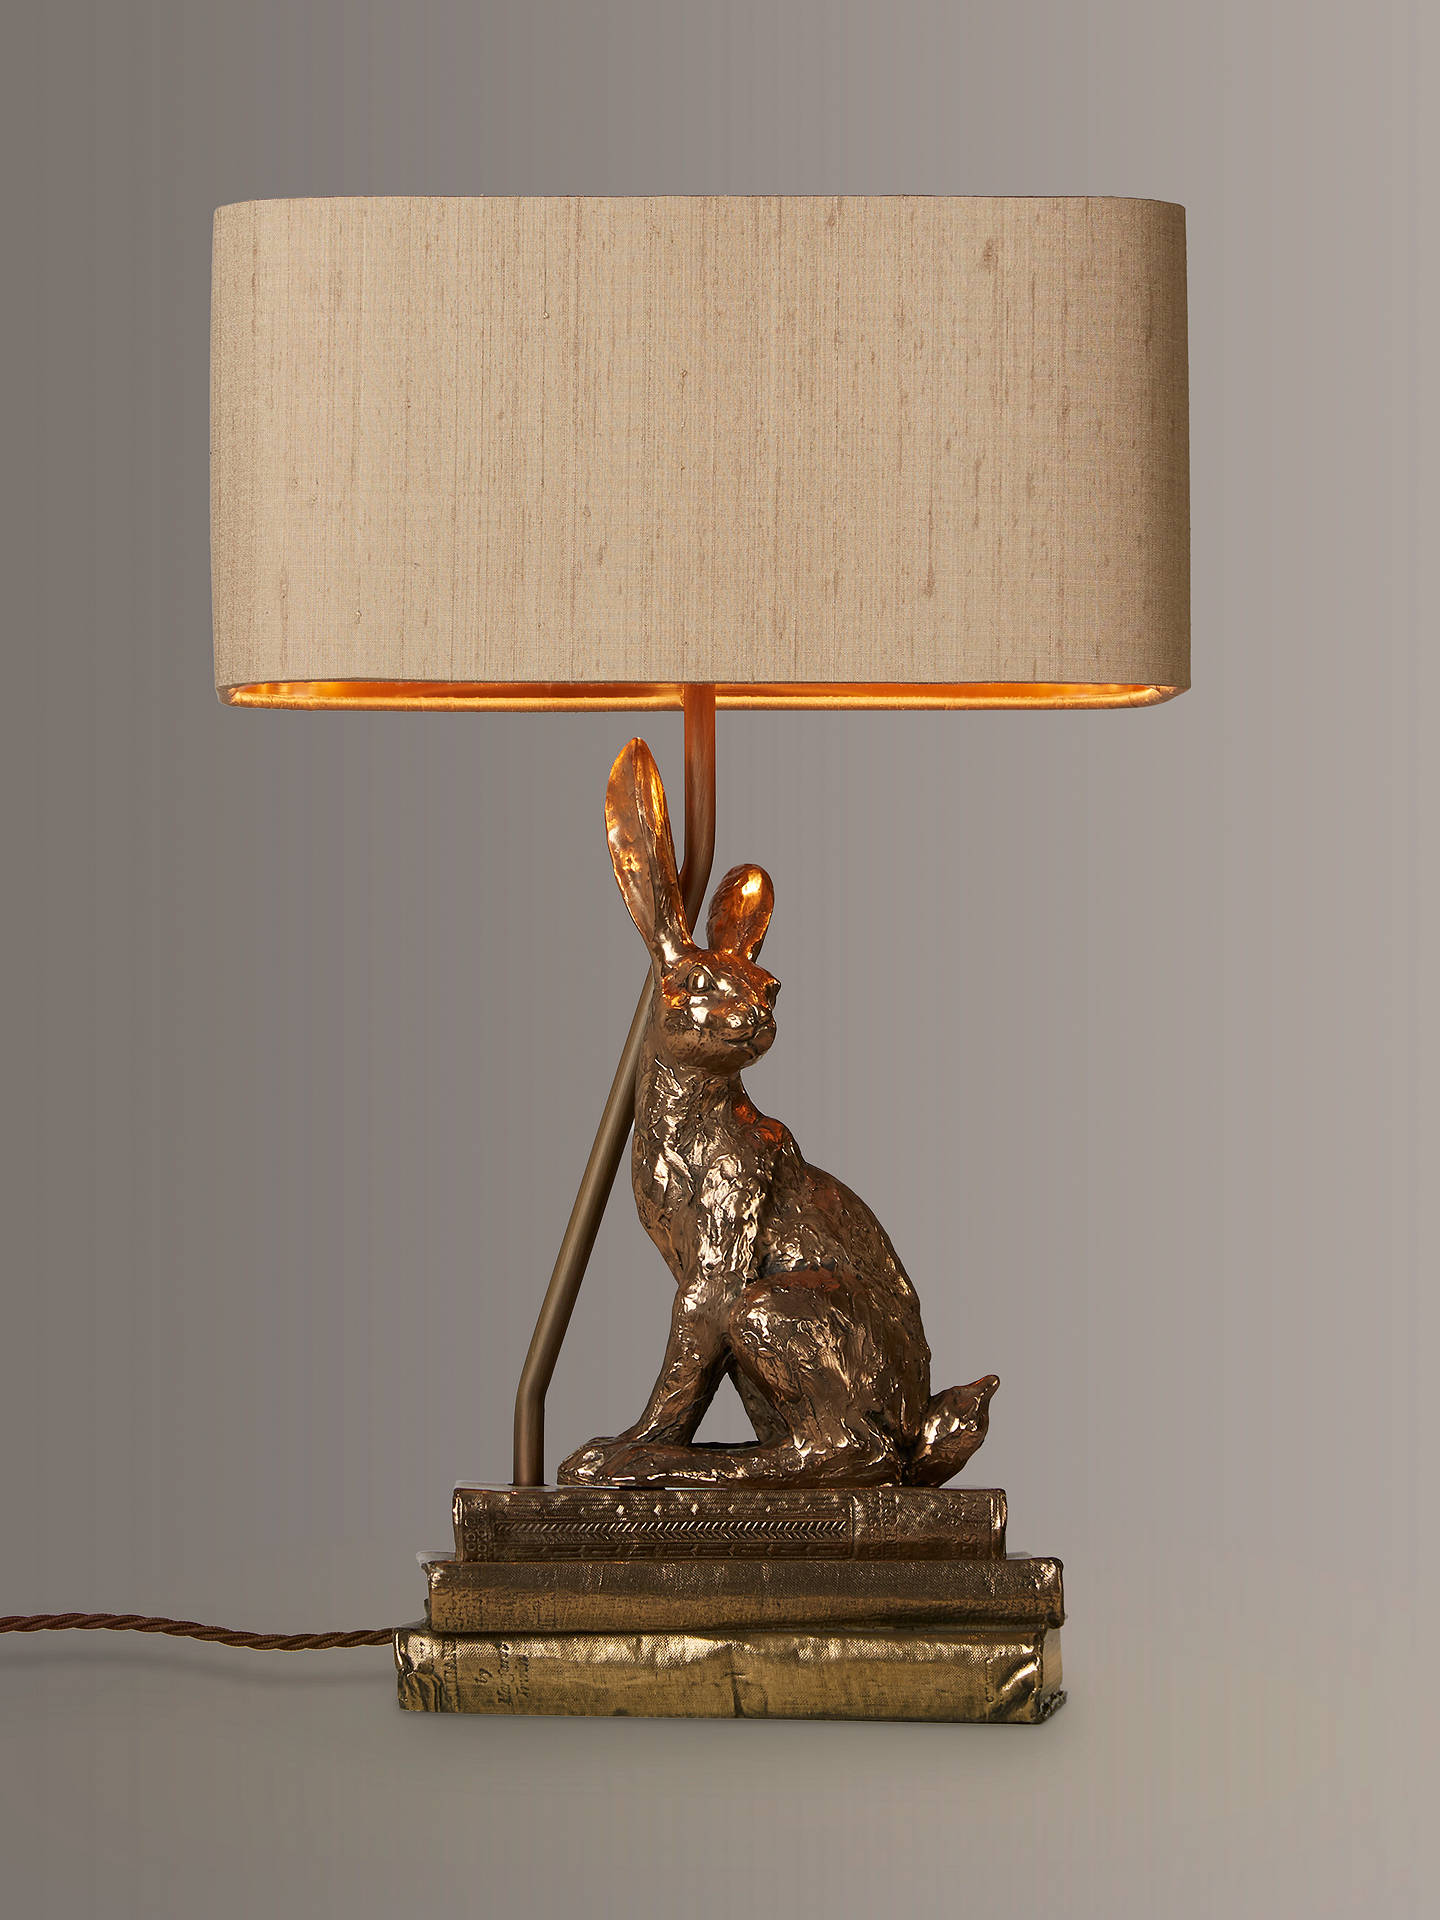 Buy David Hunt Hare Table Lamp, Bronze Online at johnlewis.com